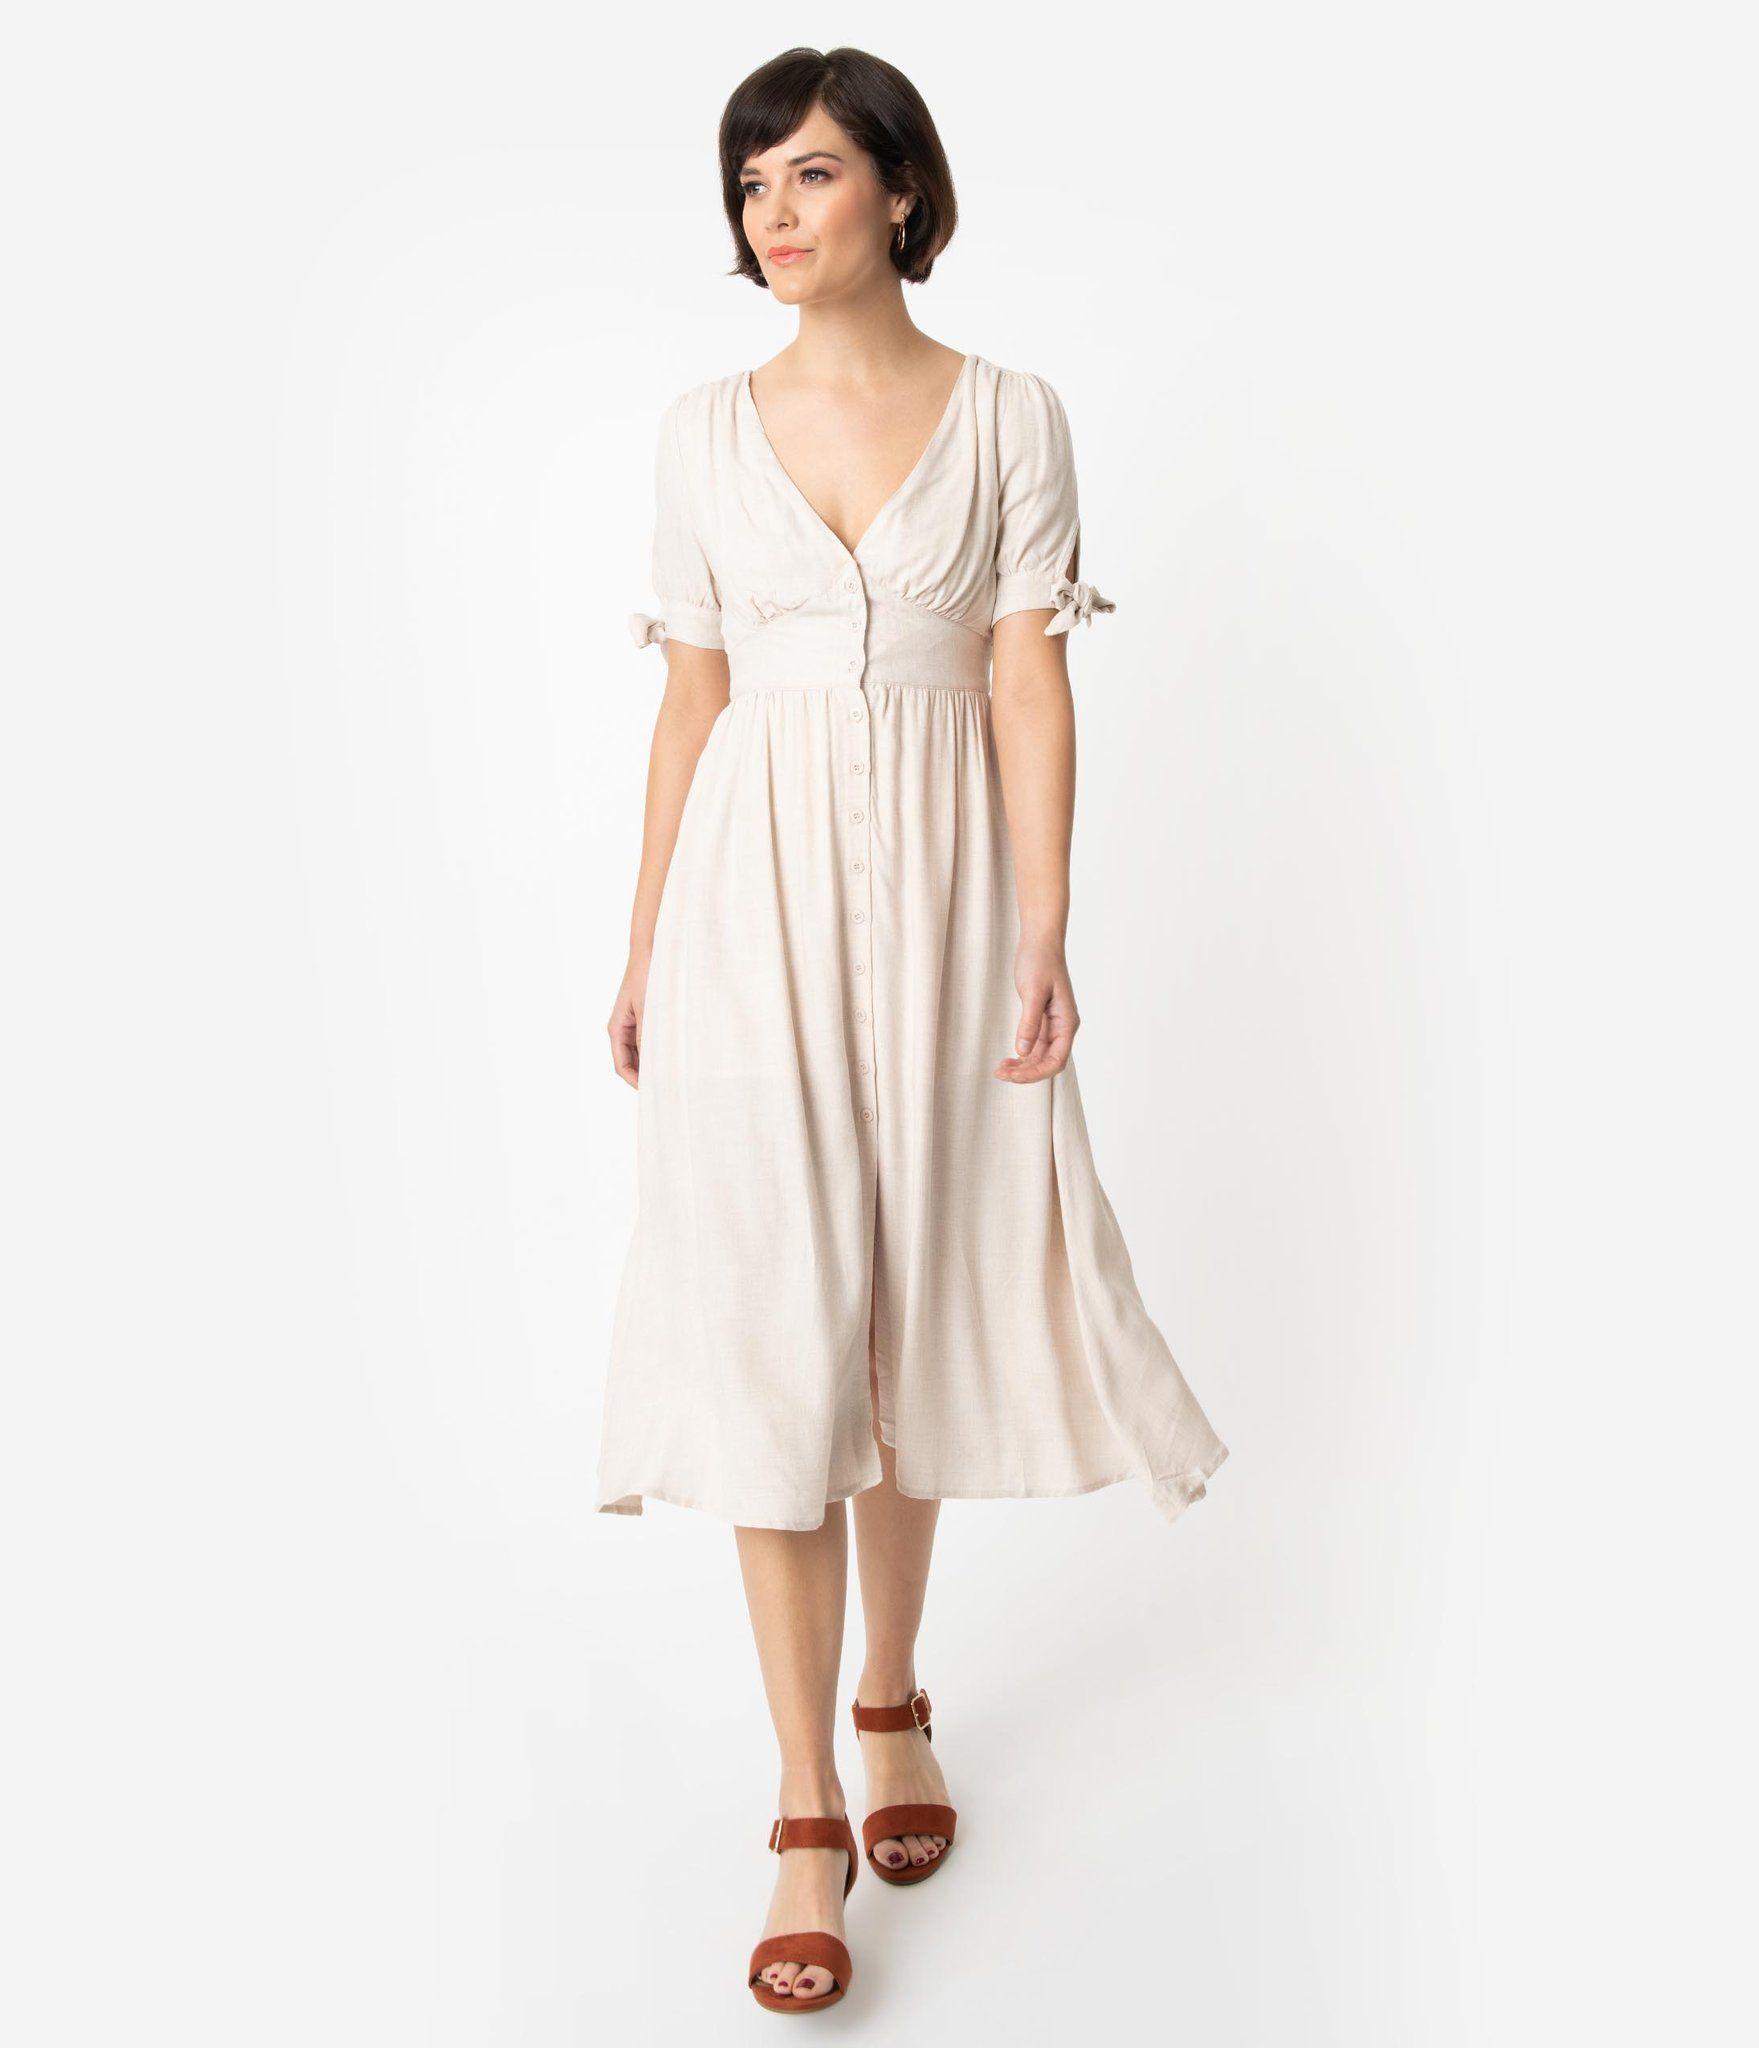 1930s Style Toasted Oatmeal Woven Short Sleeve Button Up Midi Dress Unique Vintage 1930s Fashion Unique Dresses Cap Dress [ 2048 x 1759 Pixel ]